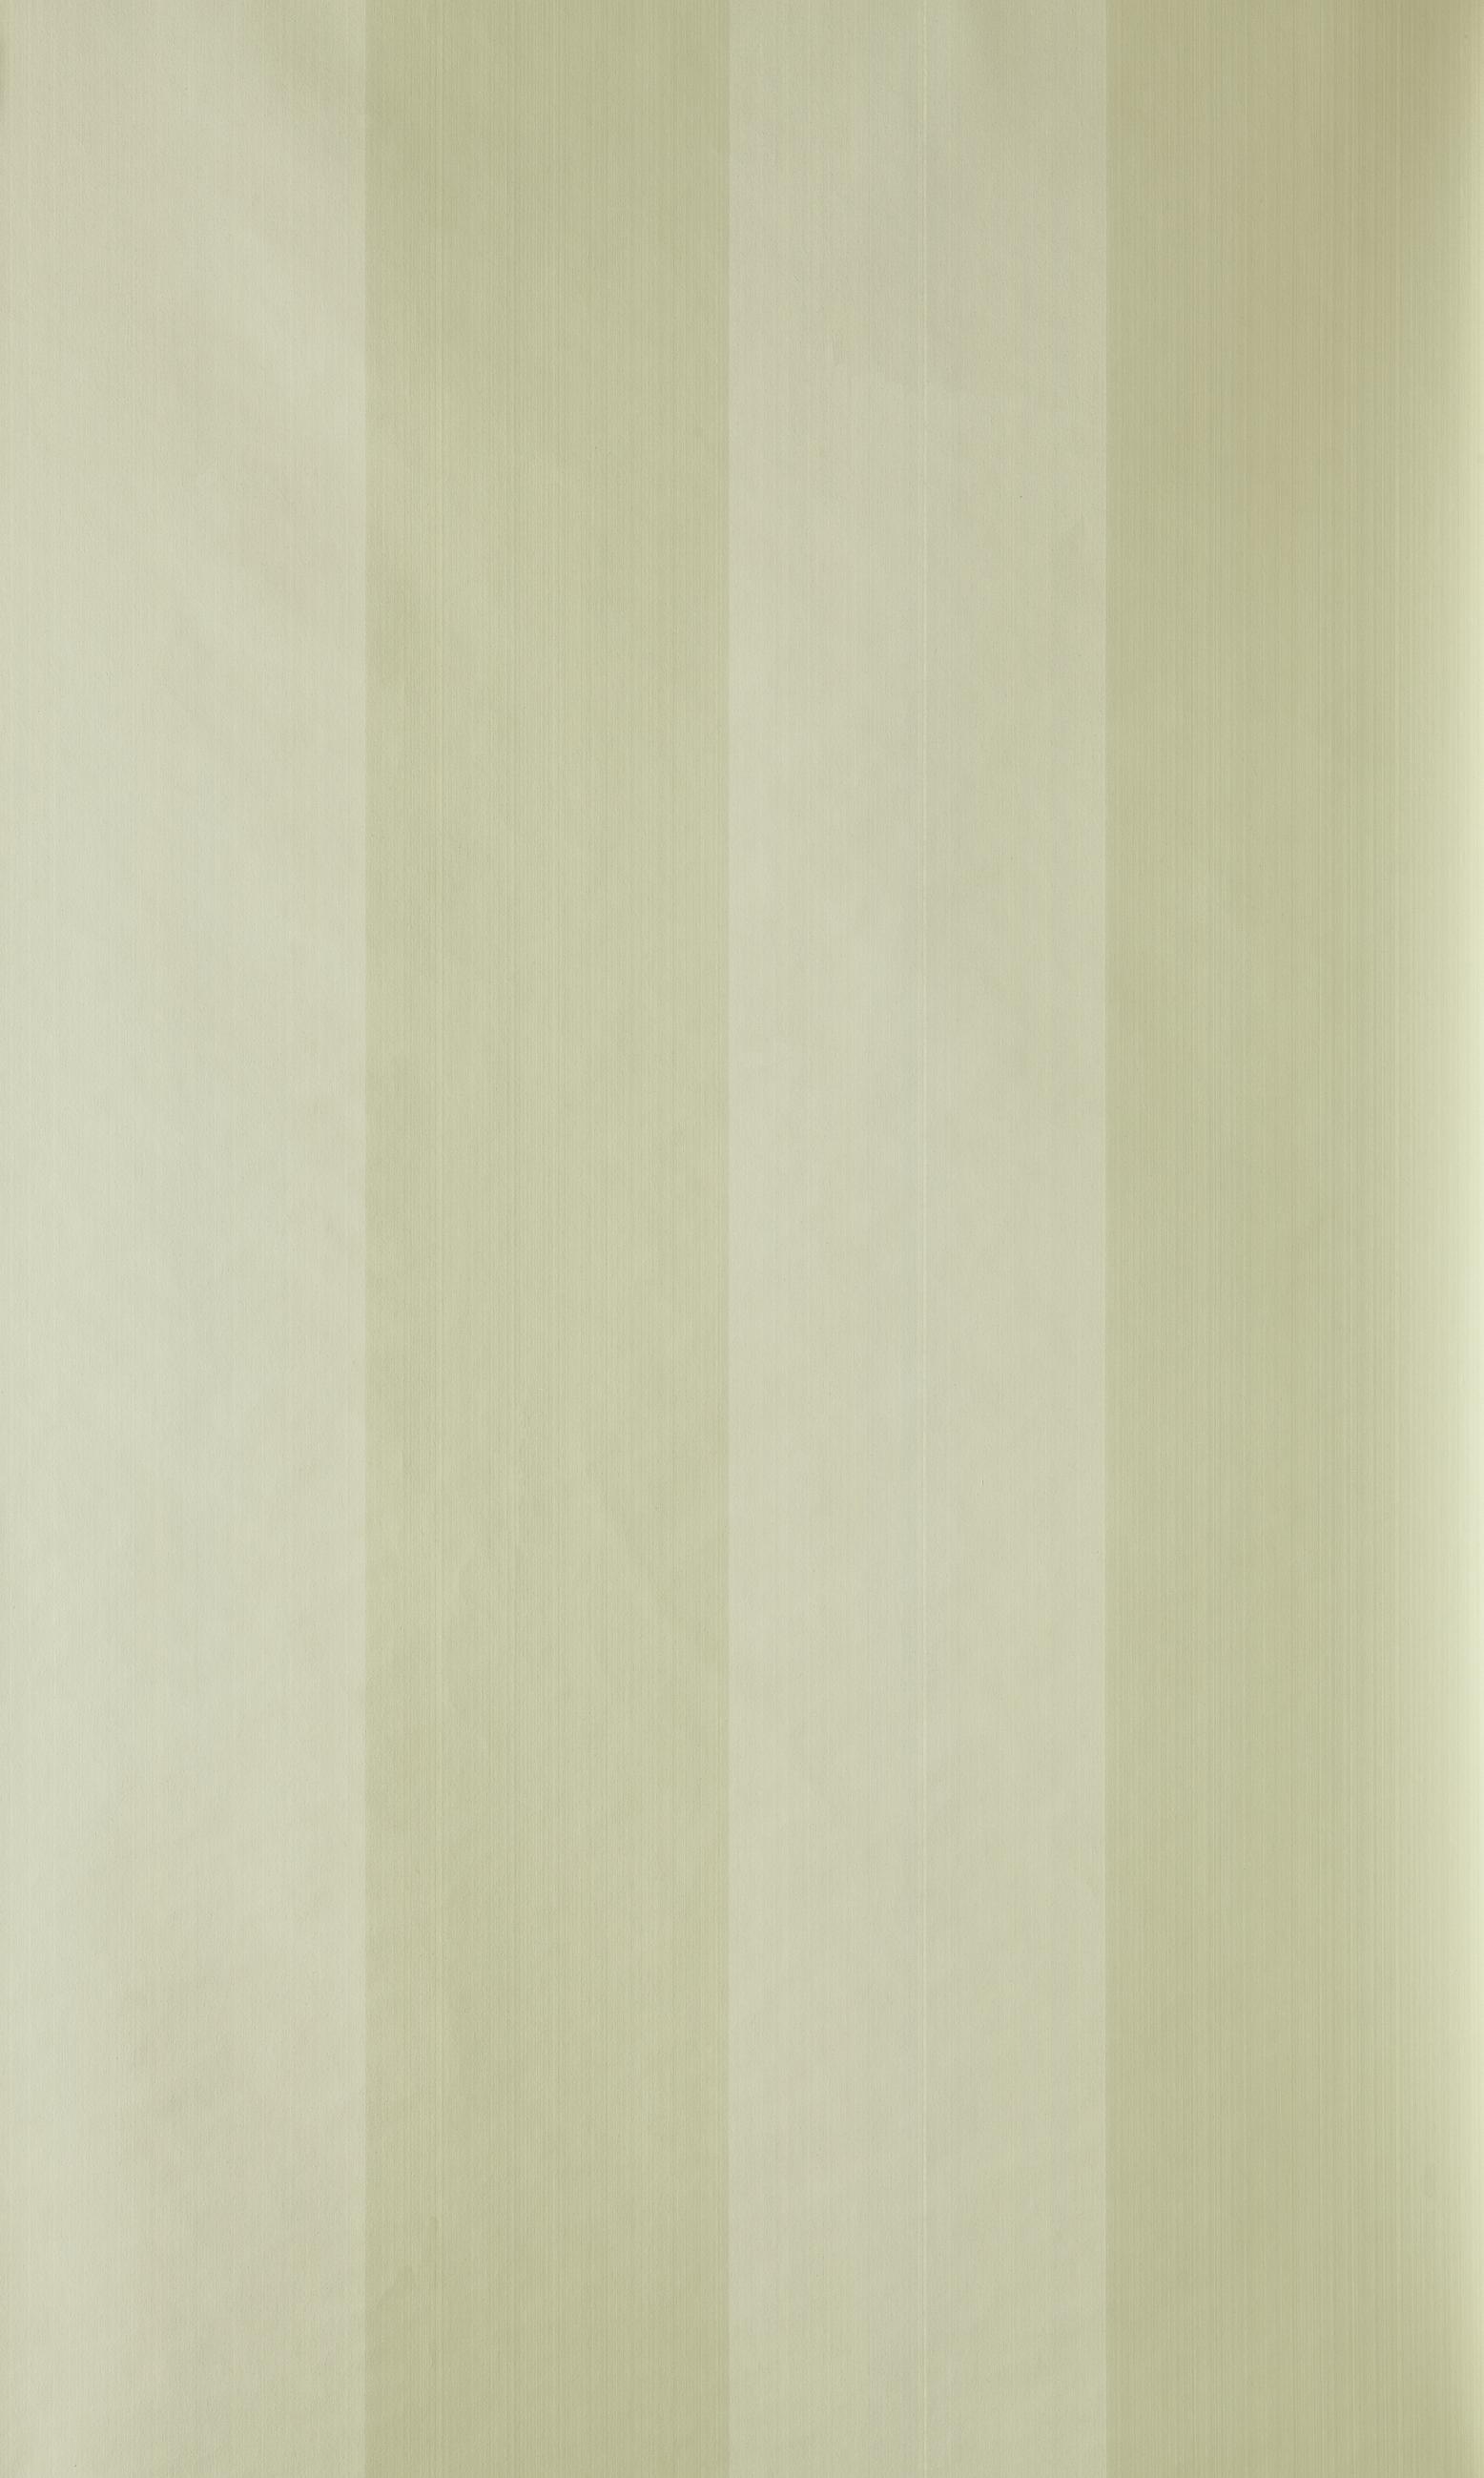 Broad Stripe 1326 $195 Per Roll  Order Now